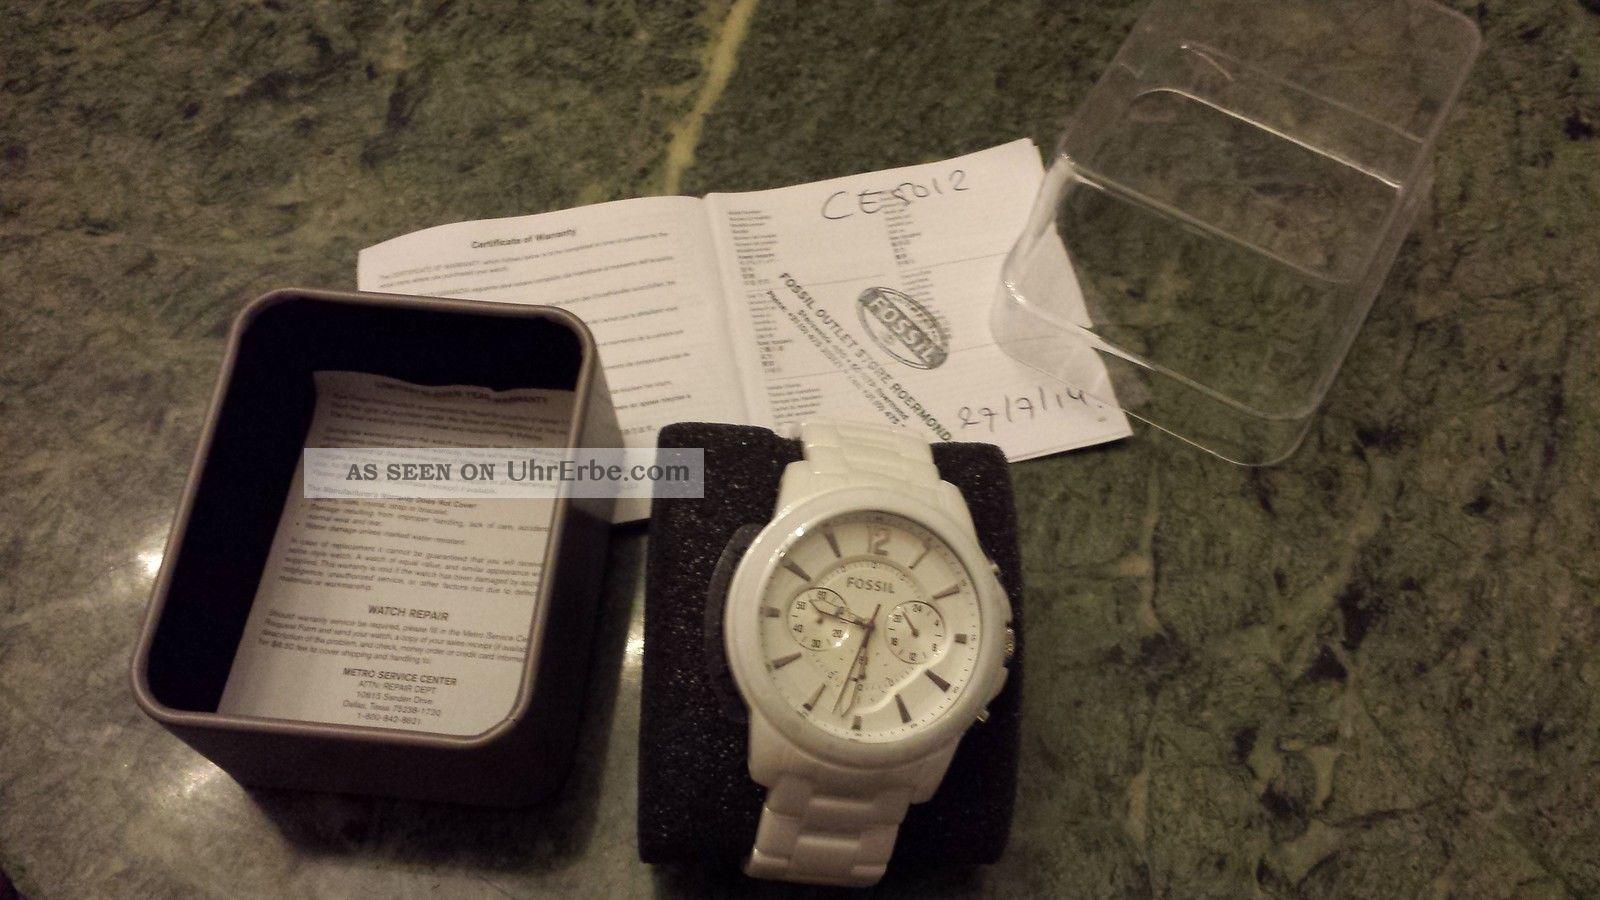 Fossil Uhr Ce5012 Keramik Unisex Armbanduhren Bild